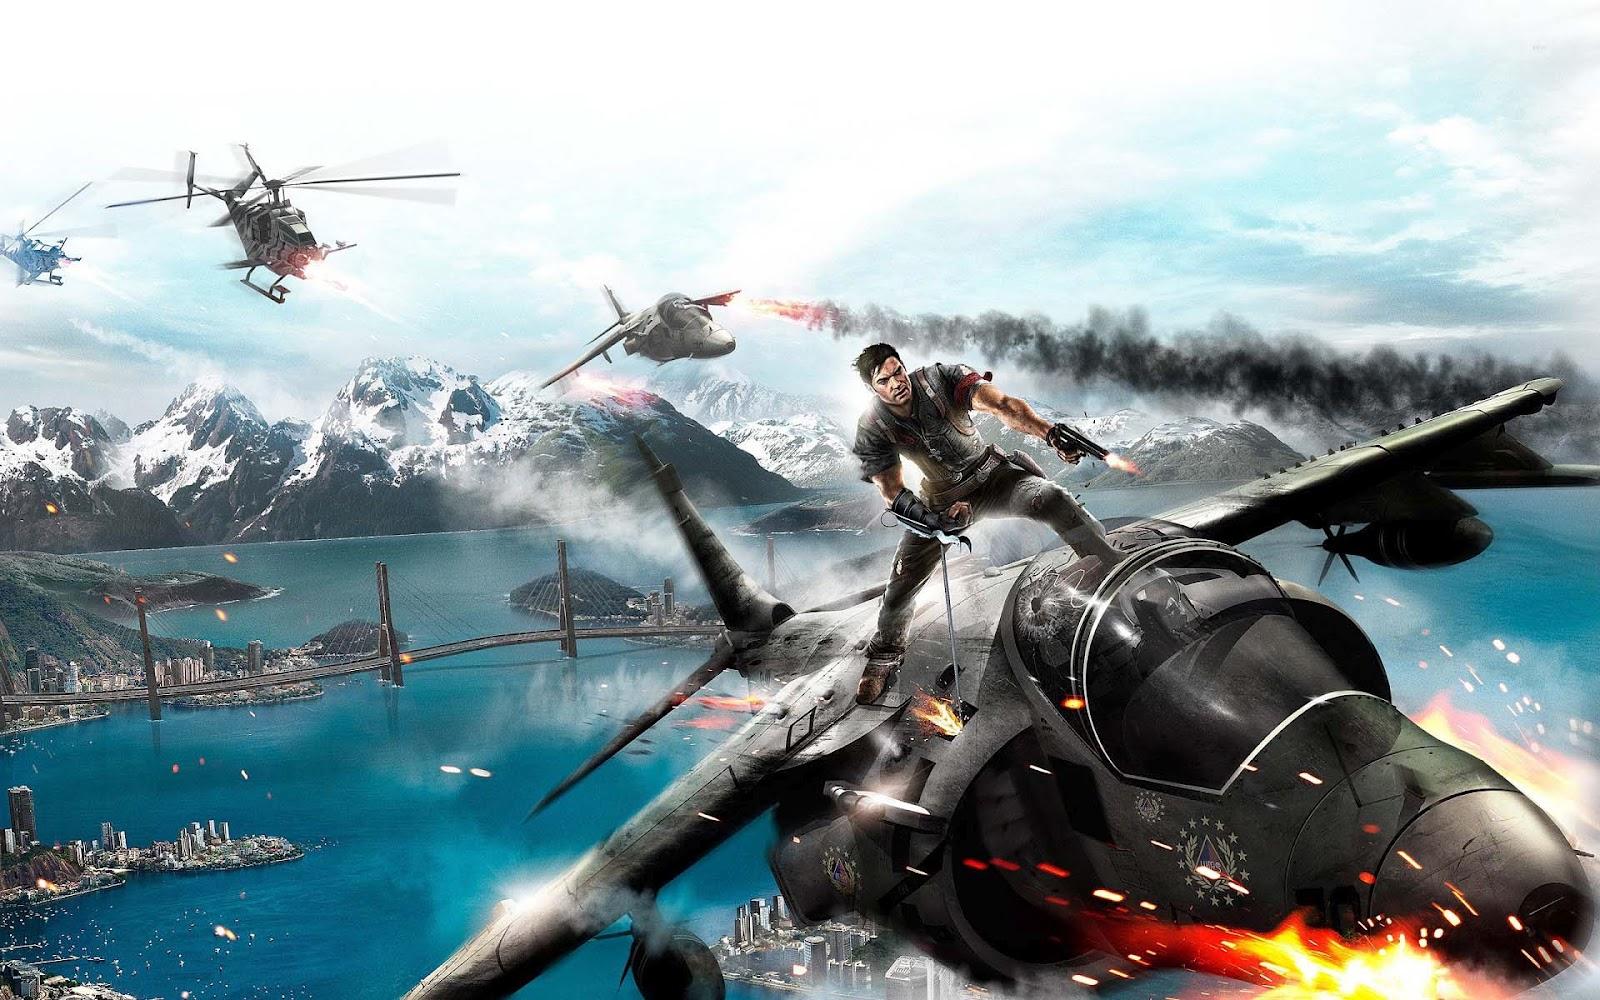 Game wallpaper van Just Cause 2 HD spel Just Cause 2 achtergrond 1600x1000